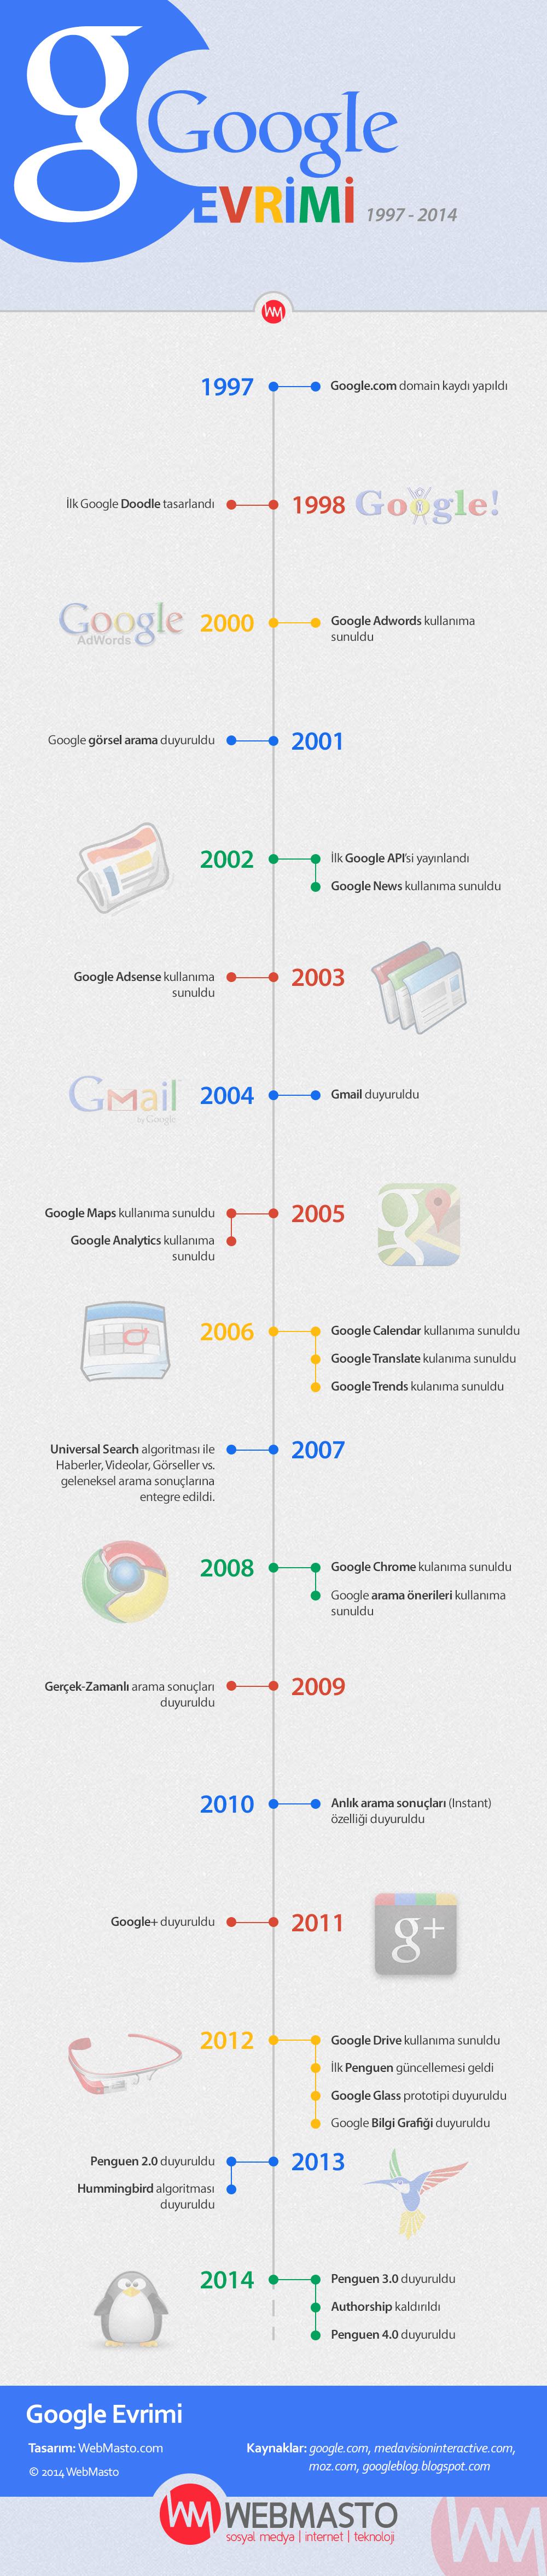 Google Evrimi - WebMasto İnfografik